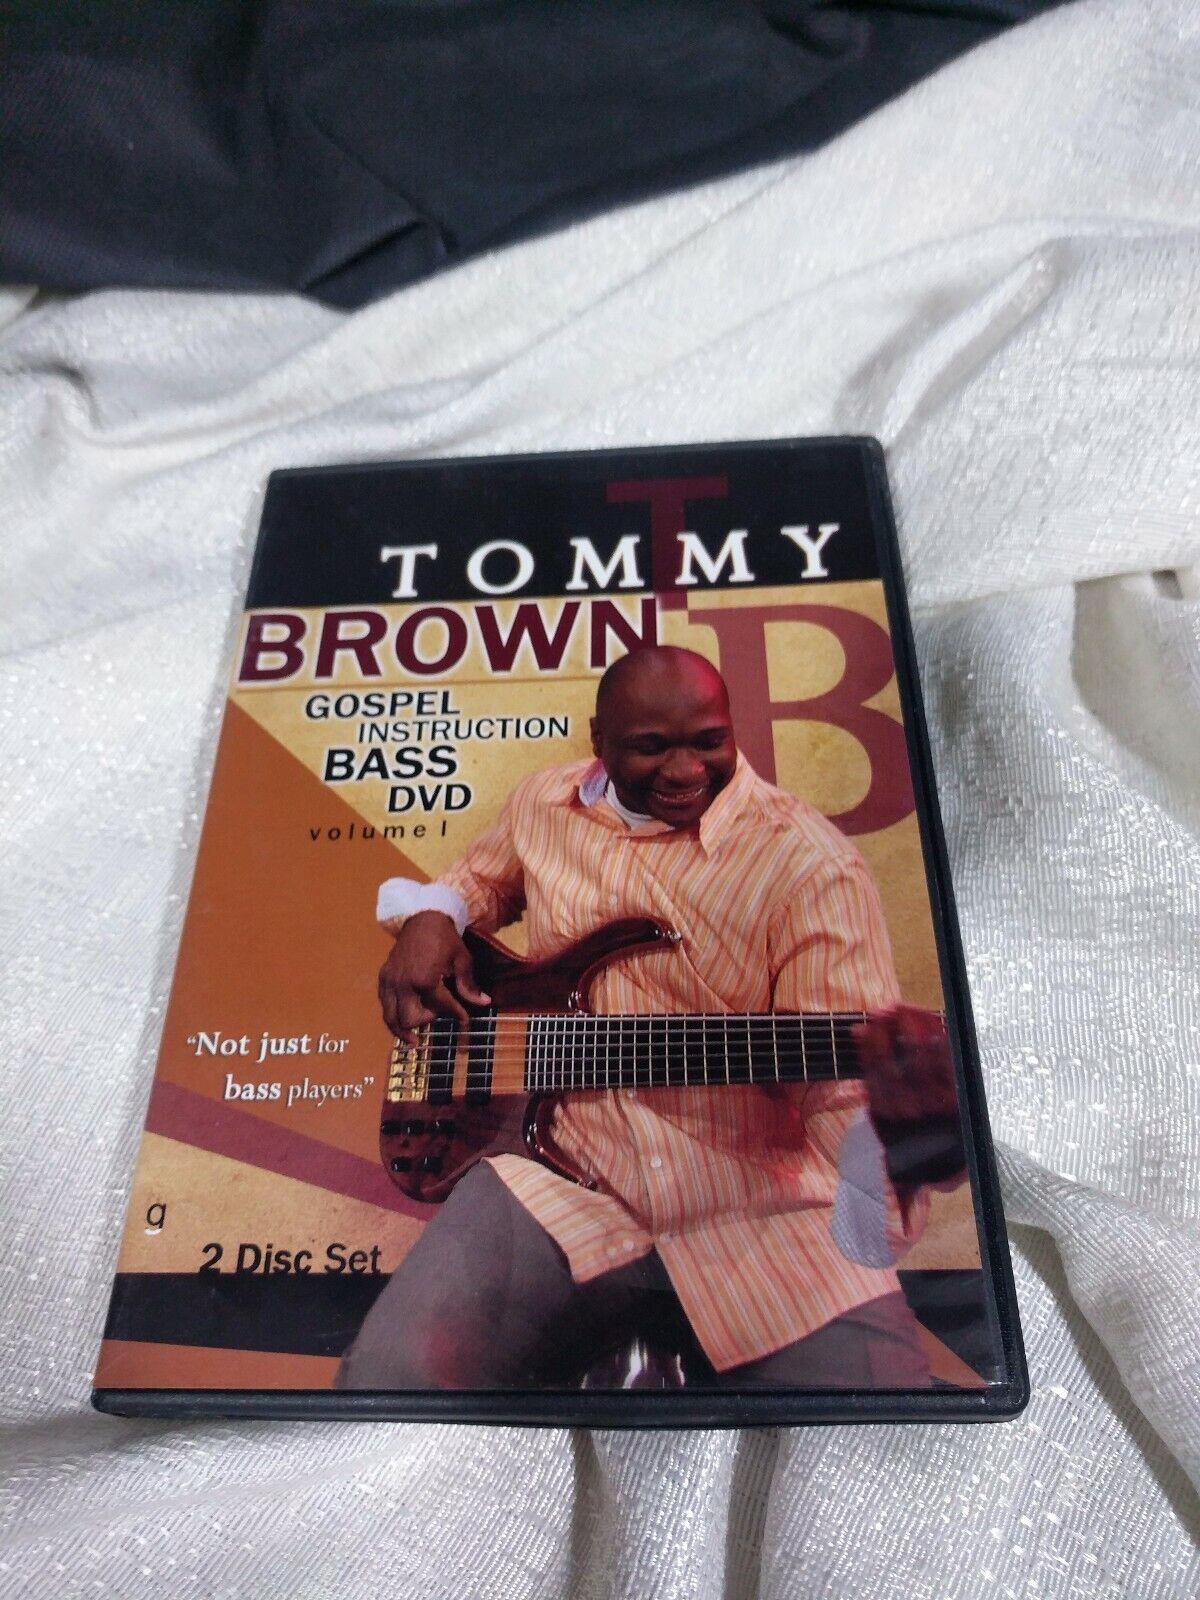 Tommy Brown Gospel Instruction Bass DVD 2 Disc Set - $19.99